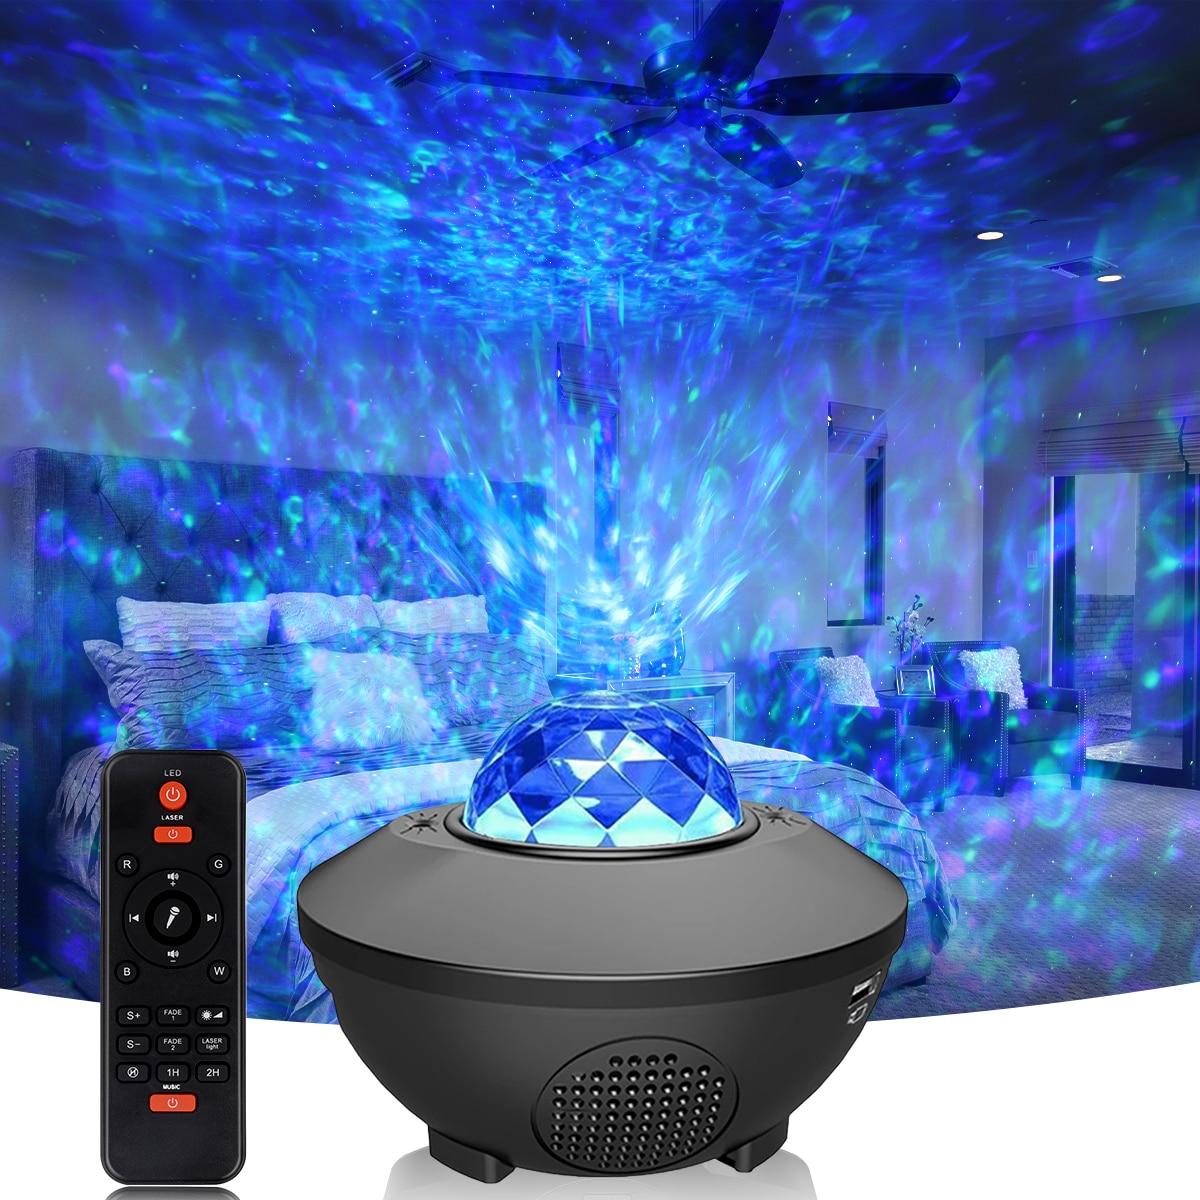 Star Moon Galaxy Projector Light Sky Laser Colorful LED Ocean Wave Music Rhythm Control Night Projector Lights